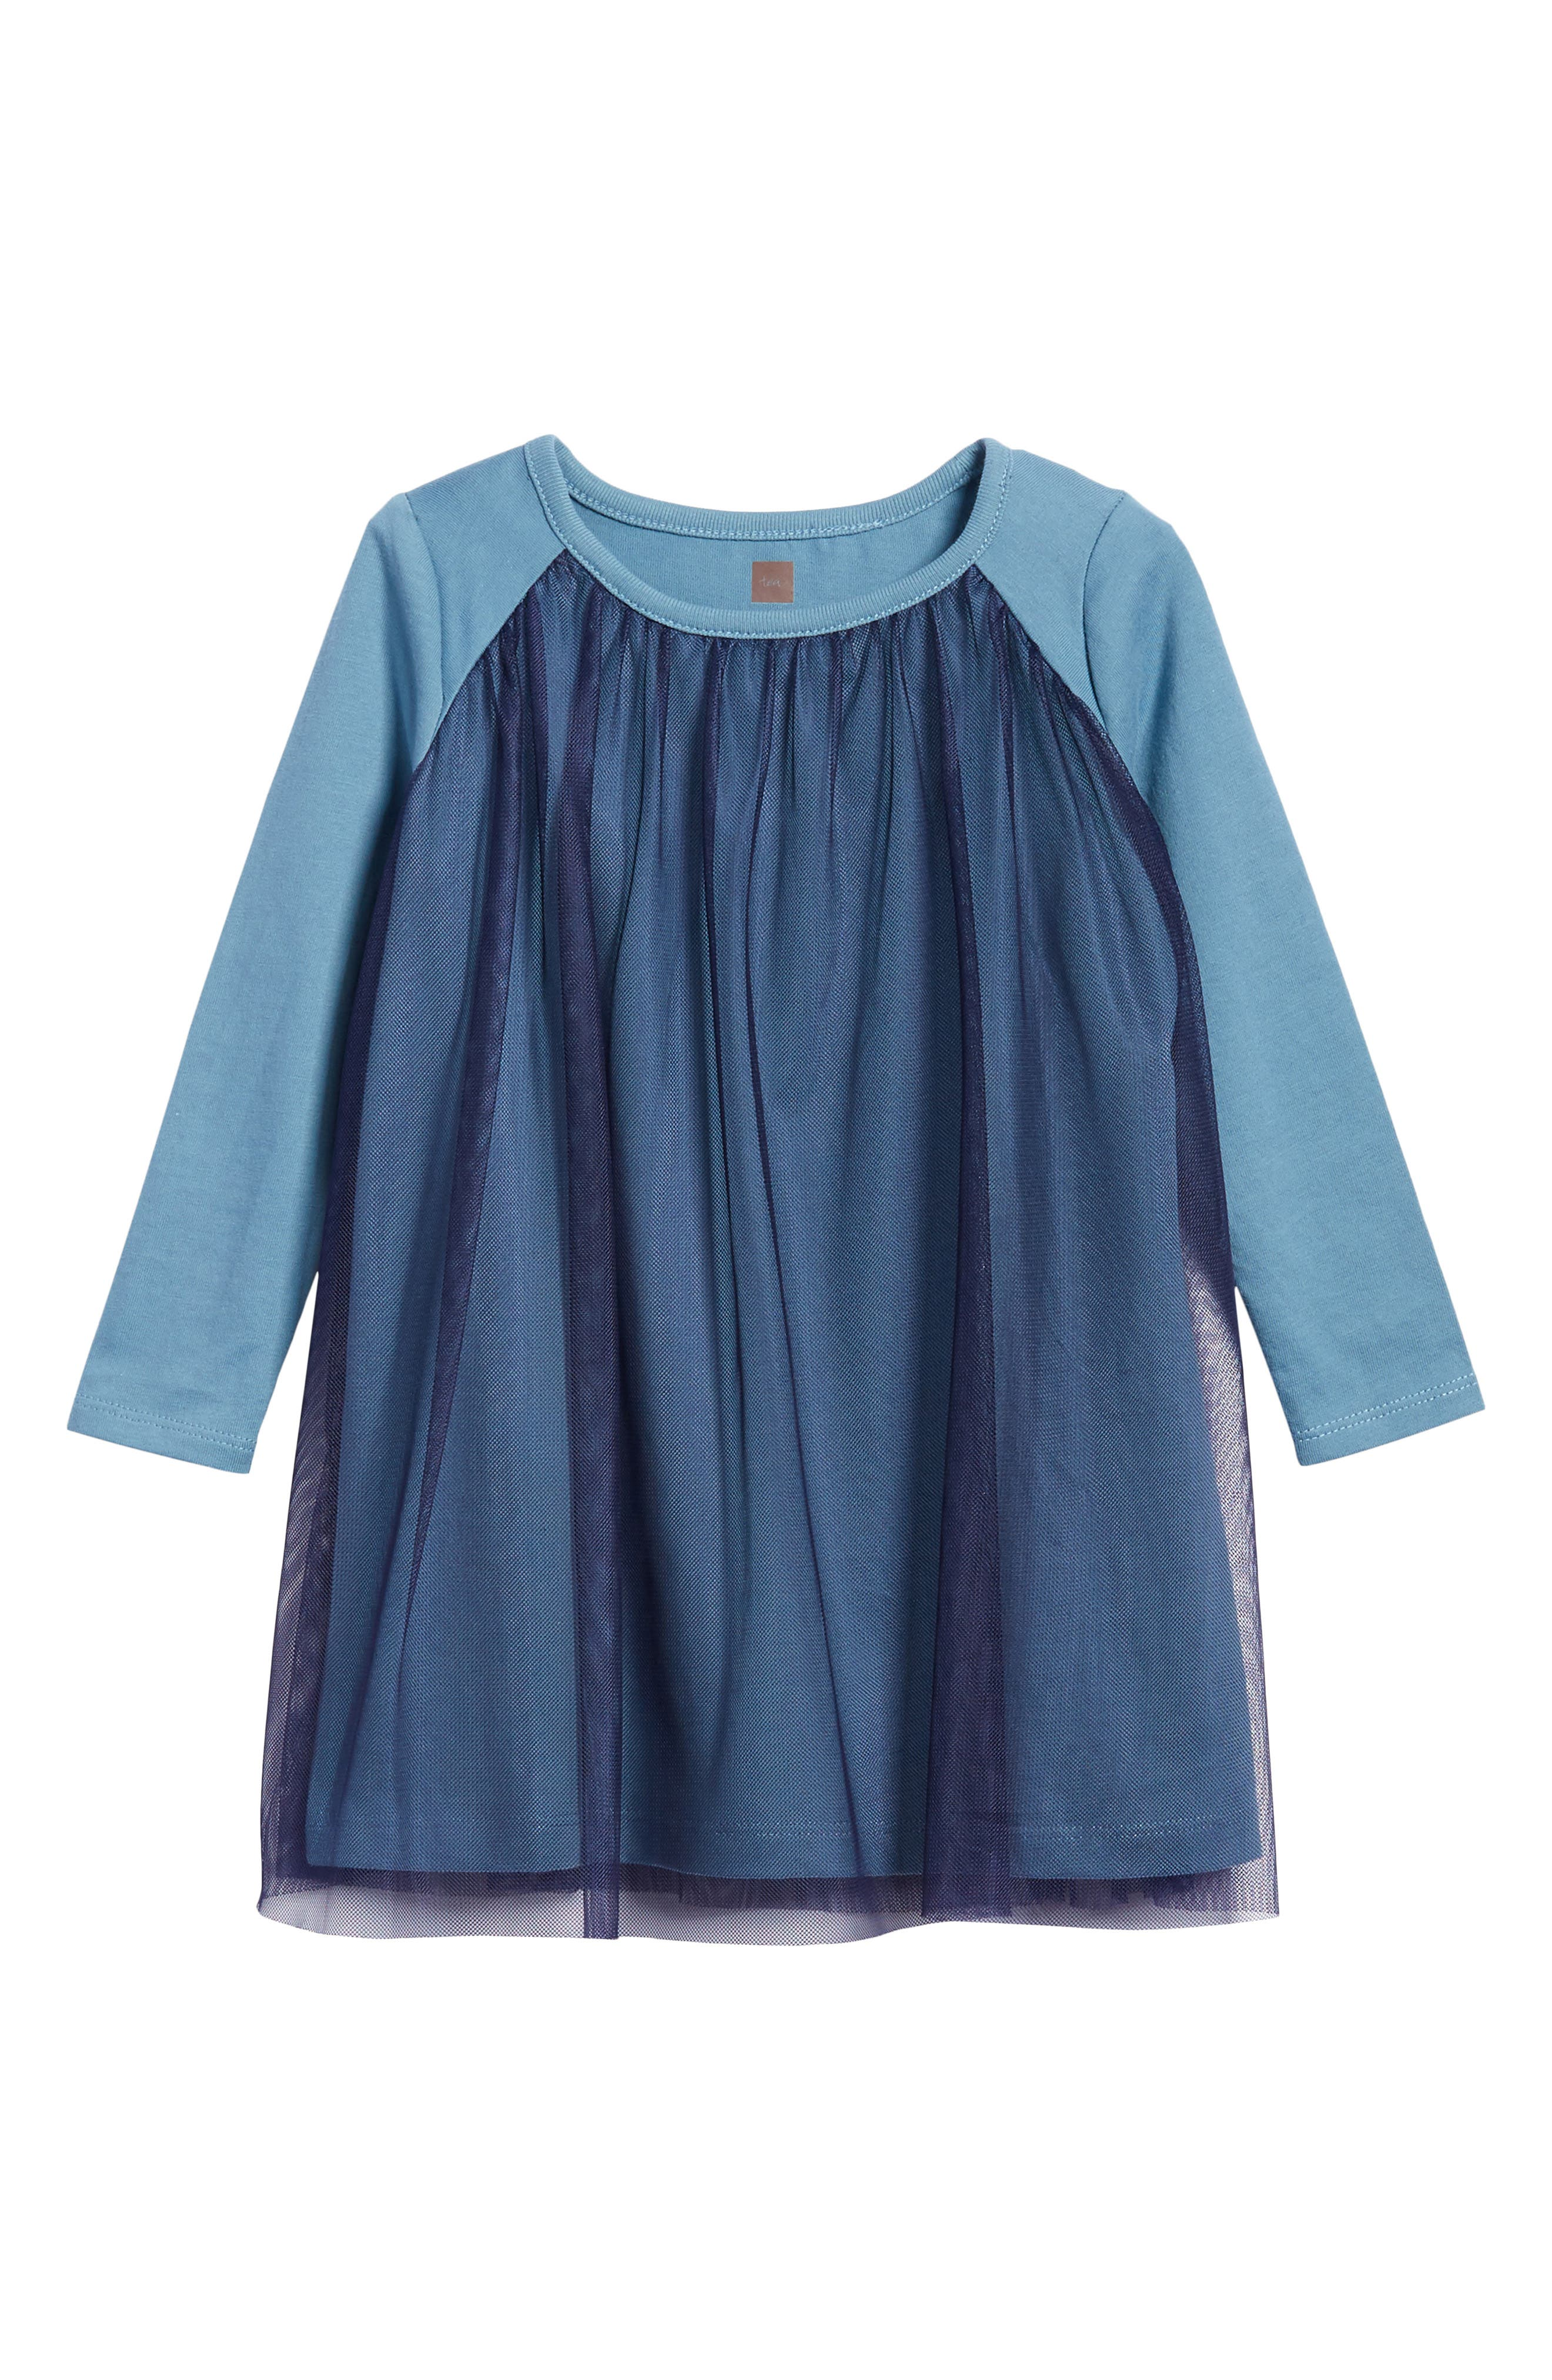 Main Image - Tea Collection Mackenzie Tulle Dress (Toddler Girls, Little Girls & Big Girls)